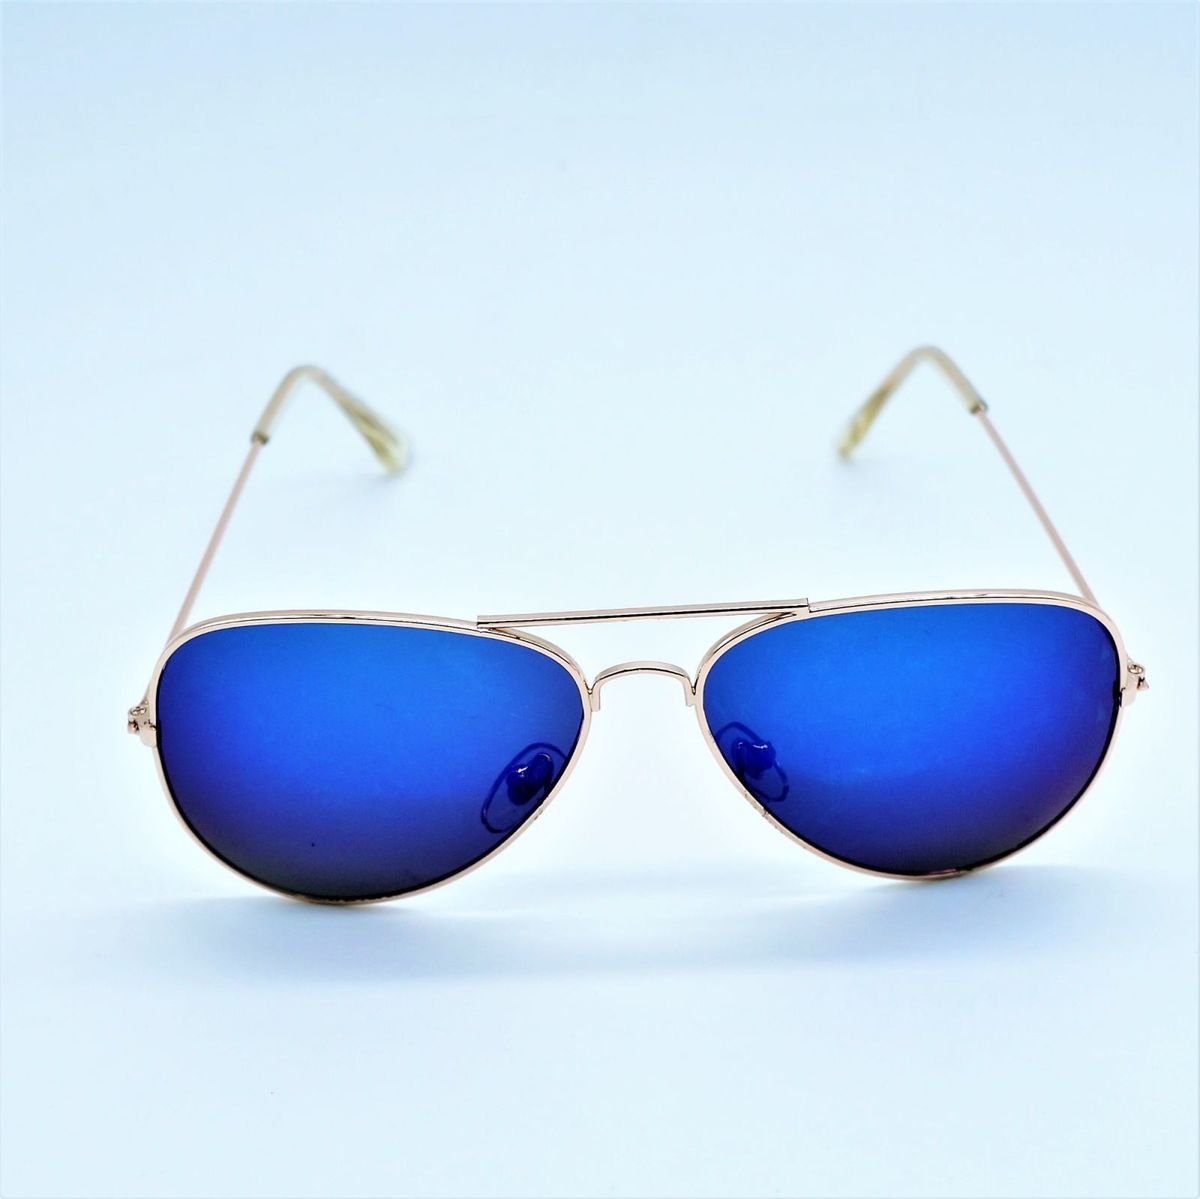 Oculos de Sol Masculino Azul Espelhado   Óculos Masculino Nunca ... a65a4cc667